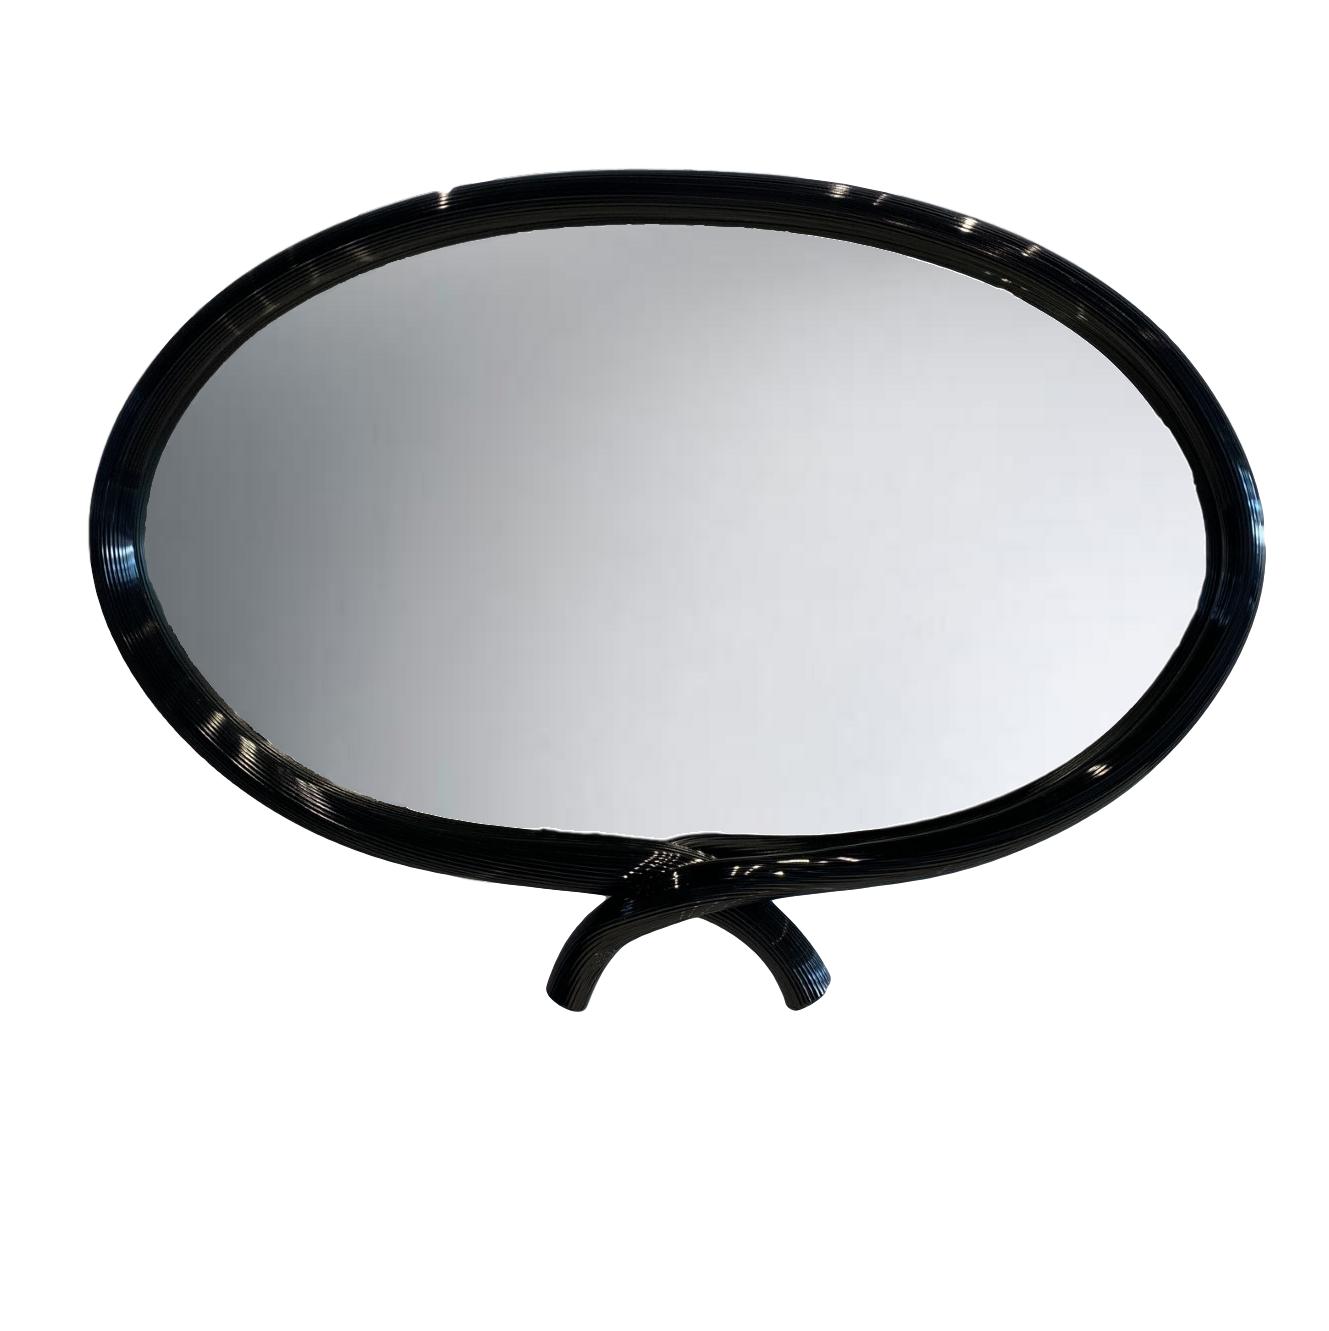 luxury furniture stores calgary mirrors fiocco mirror reflex angelo luxuries of europe